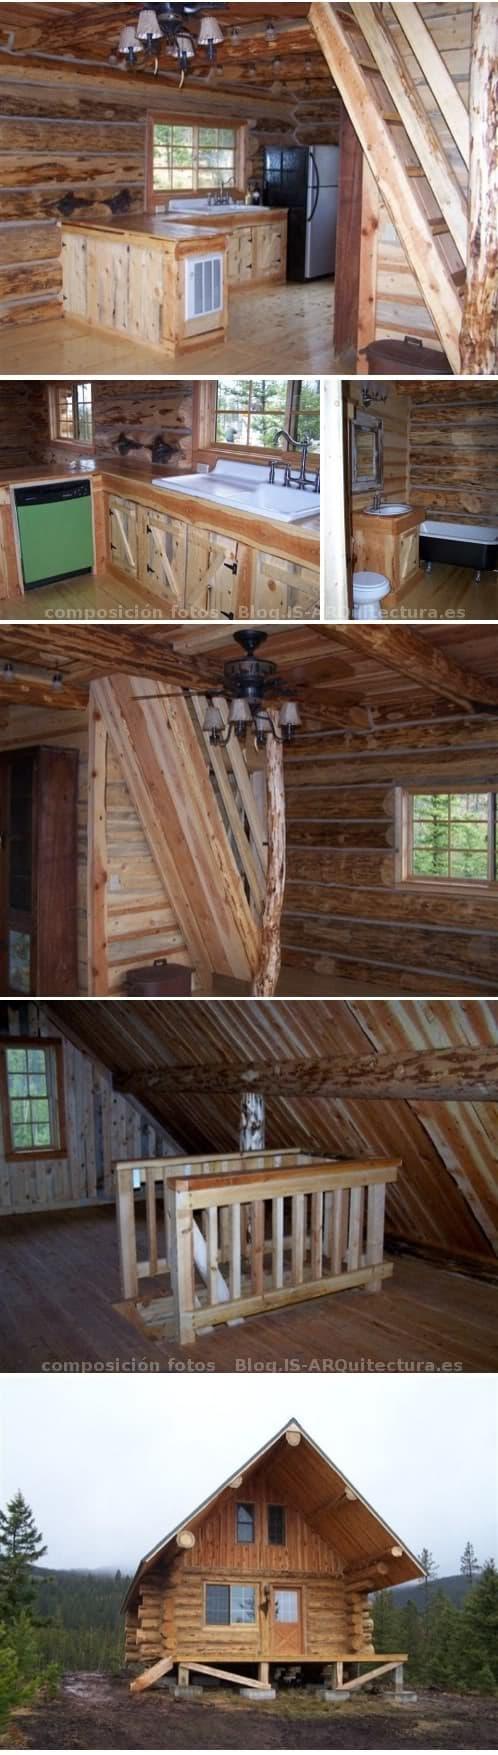 cabana-rustica-madera-roth